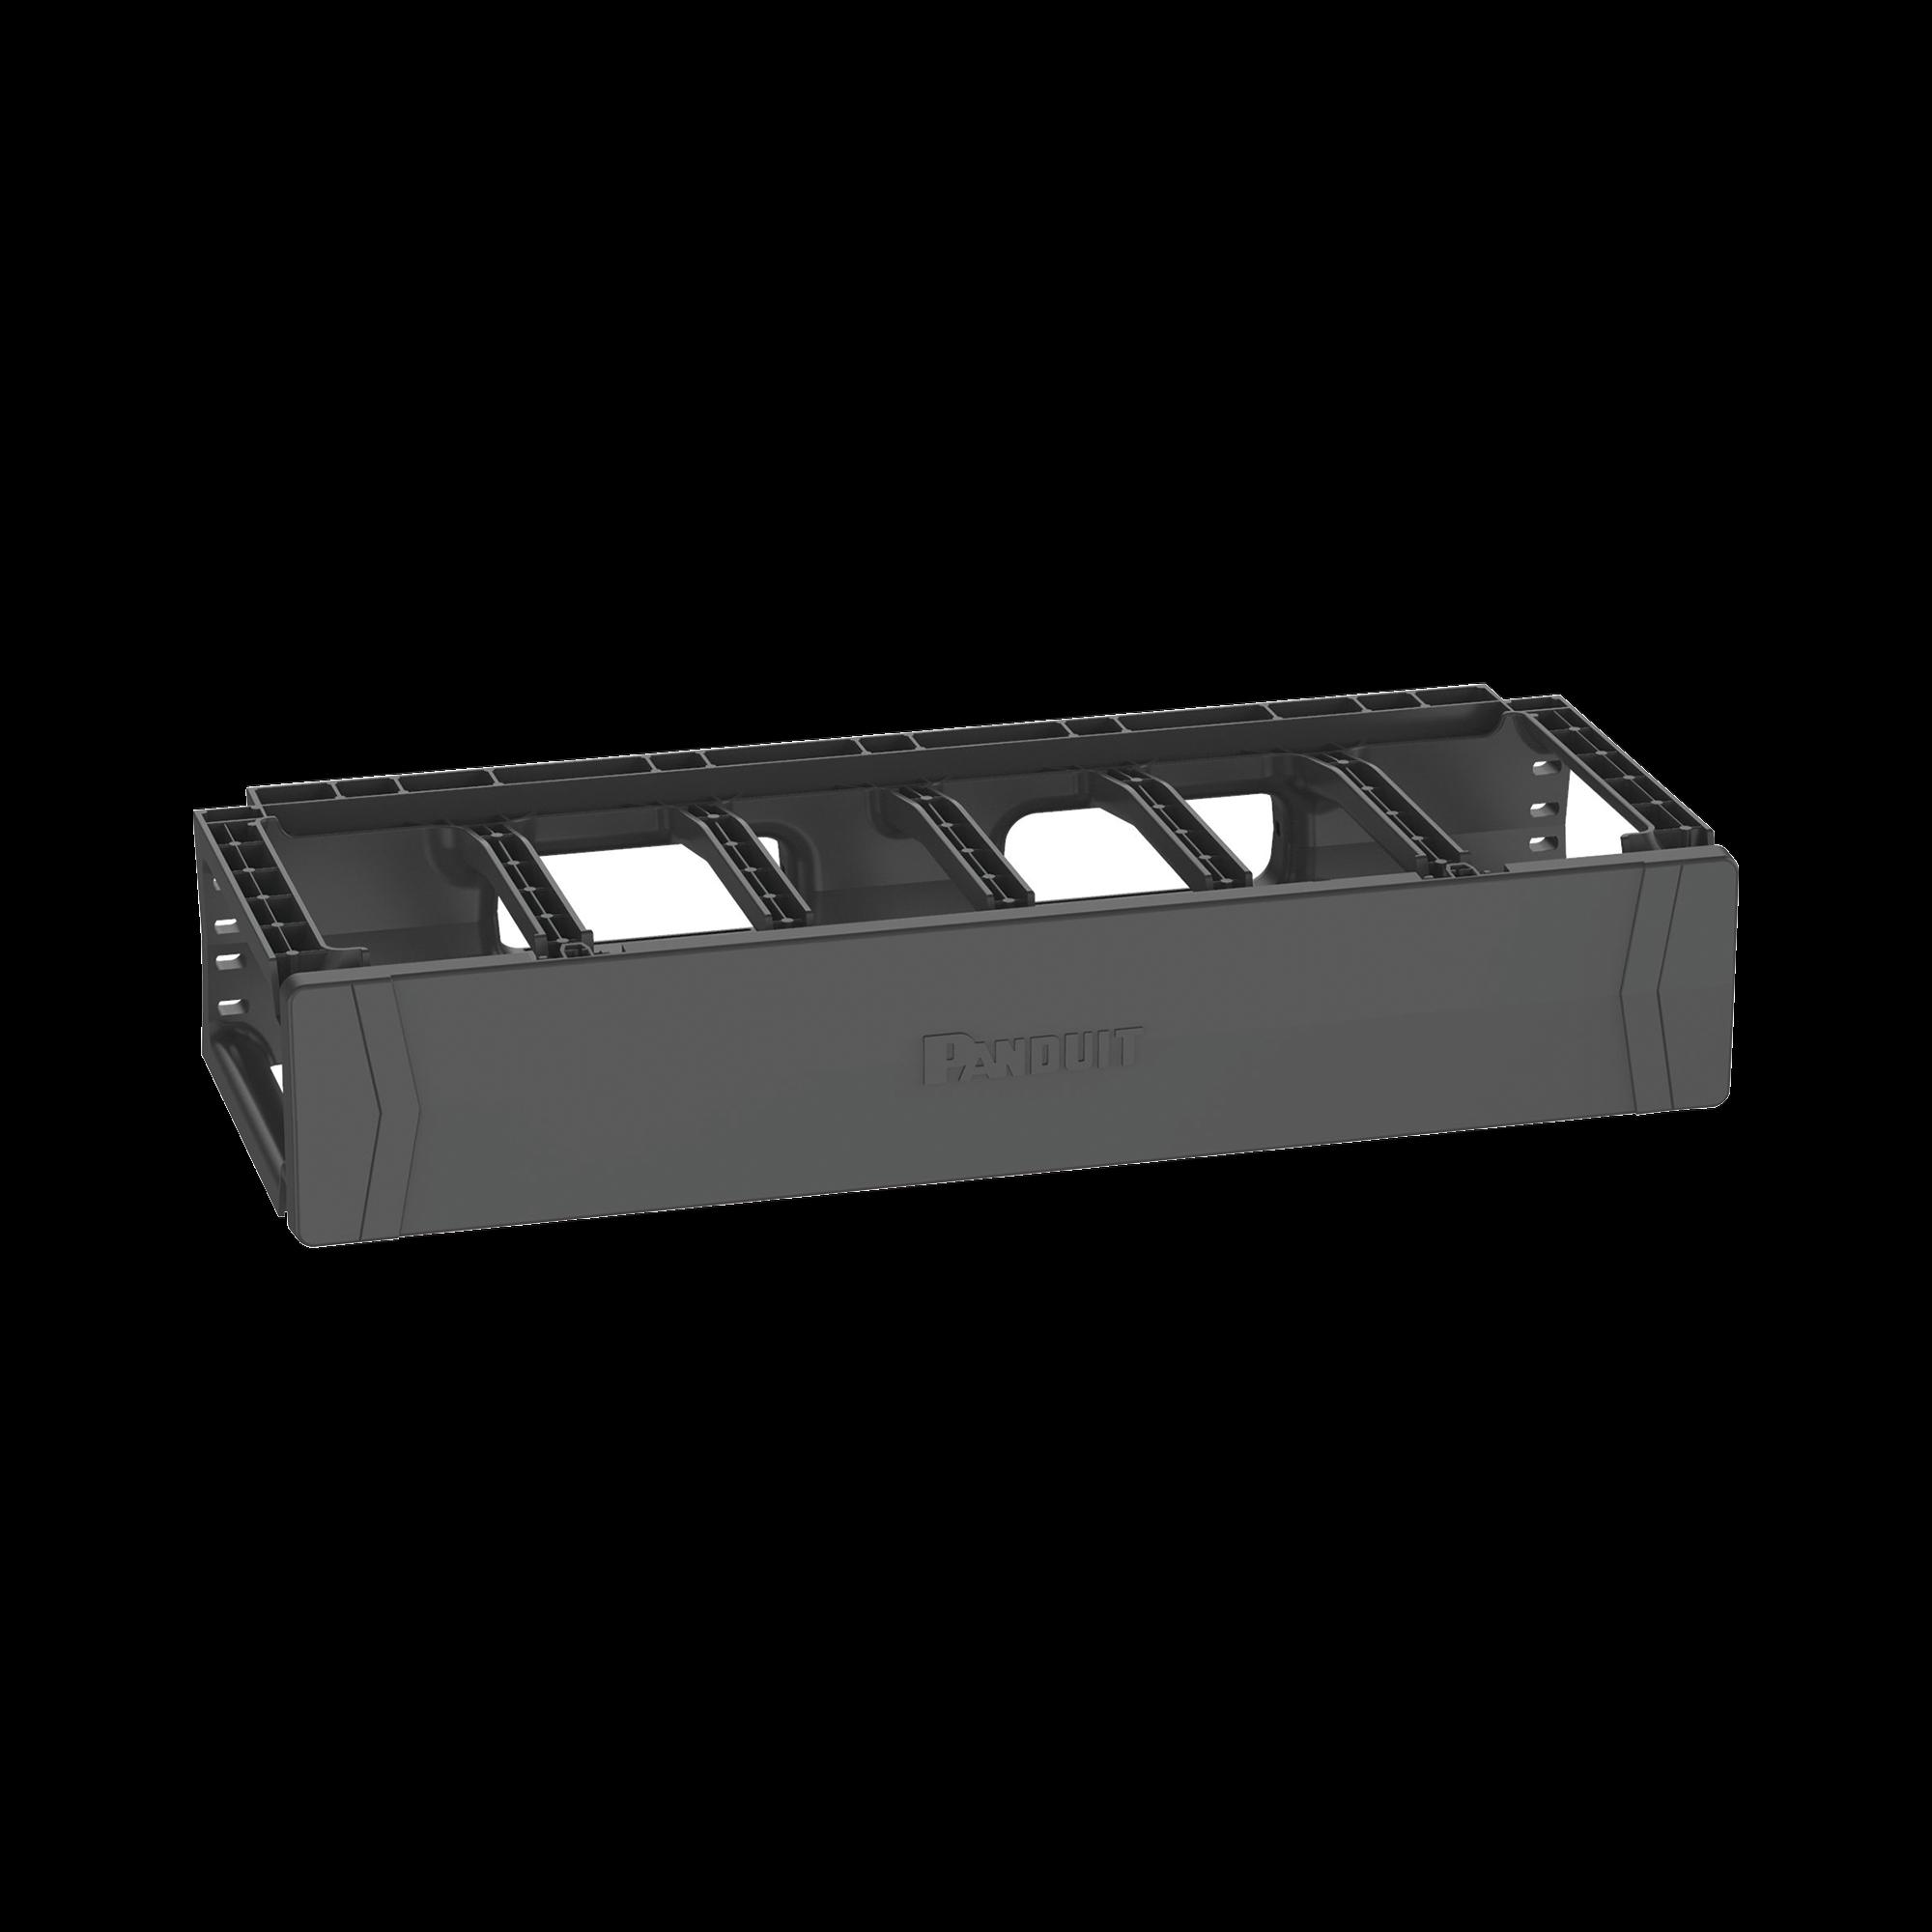 Organizador de Cables Horizontal PatchRunner?, Sencillo (Solo Frontal), Para Rack de 19in, 2UR